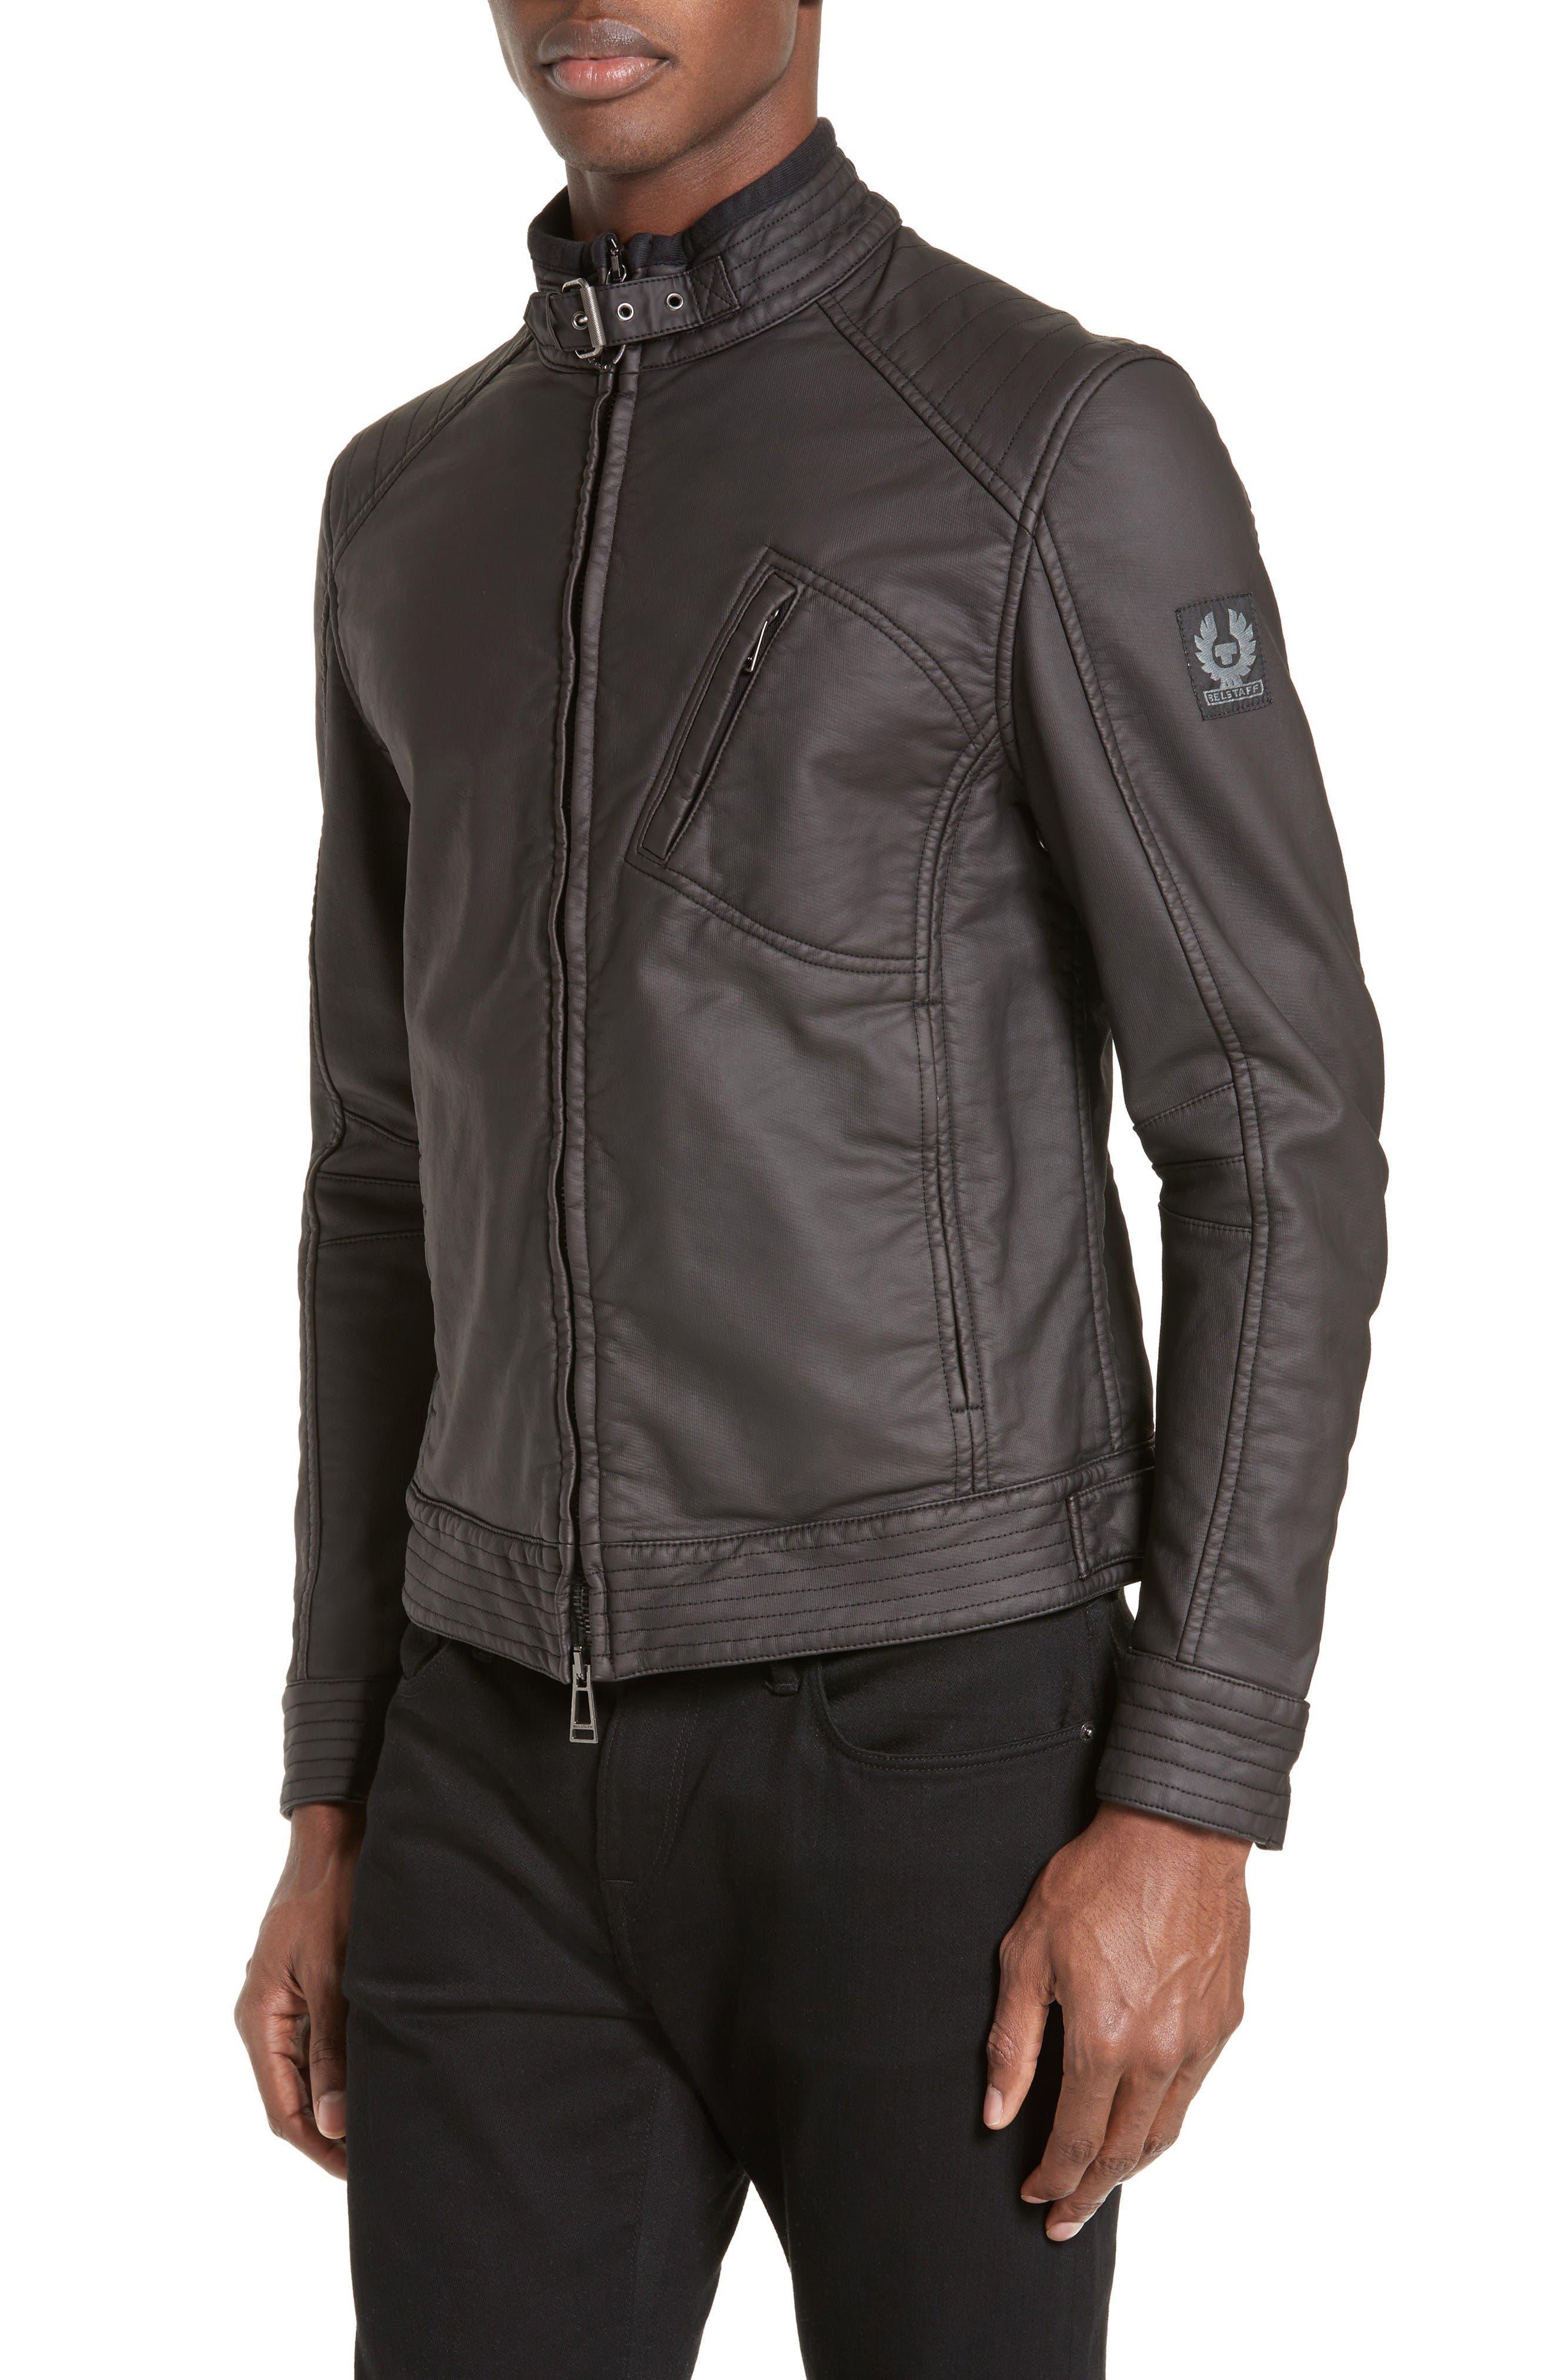 BELSTAFF 'Racer Jersey' Cotton Moto Jacket